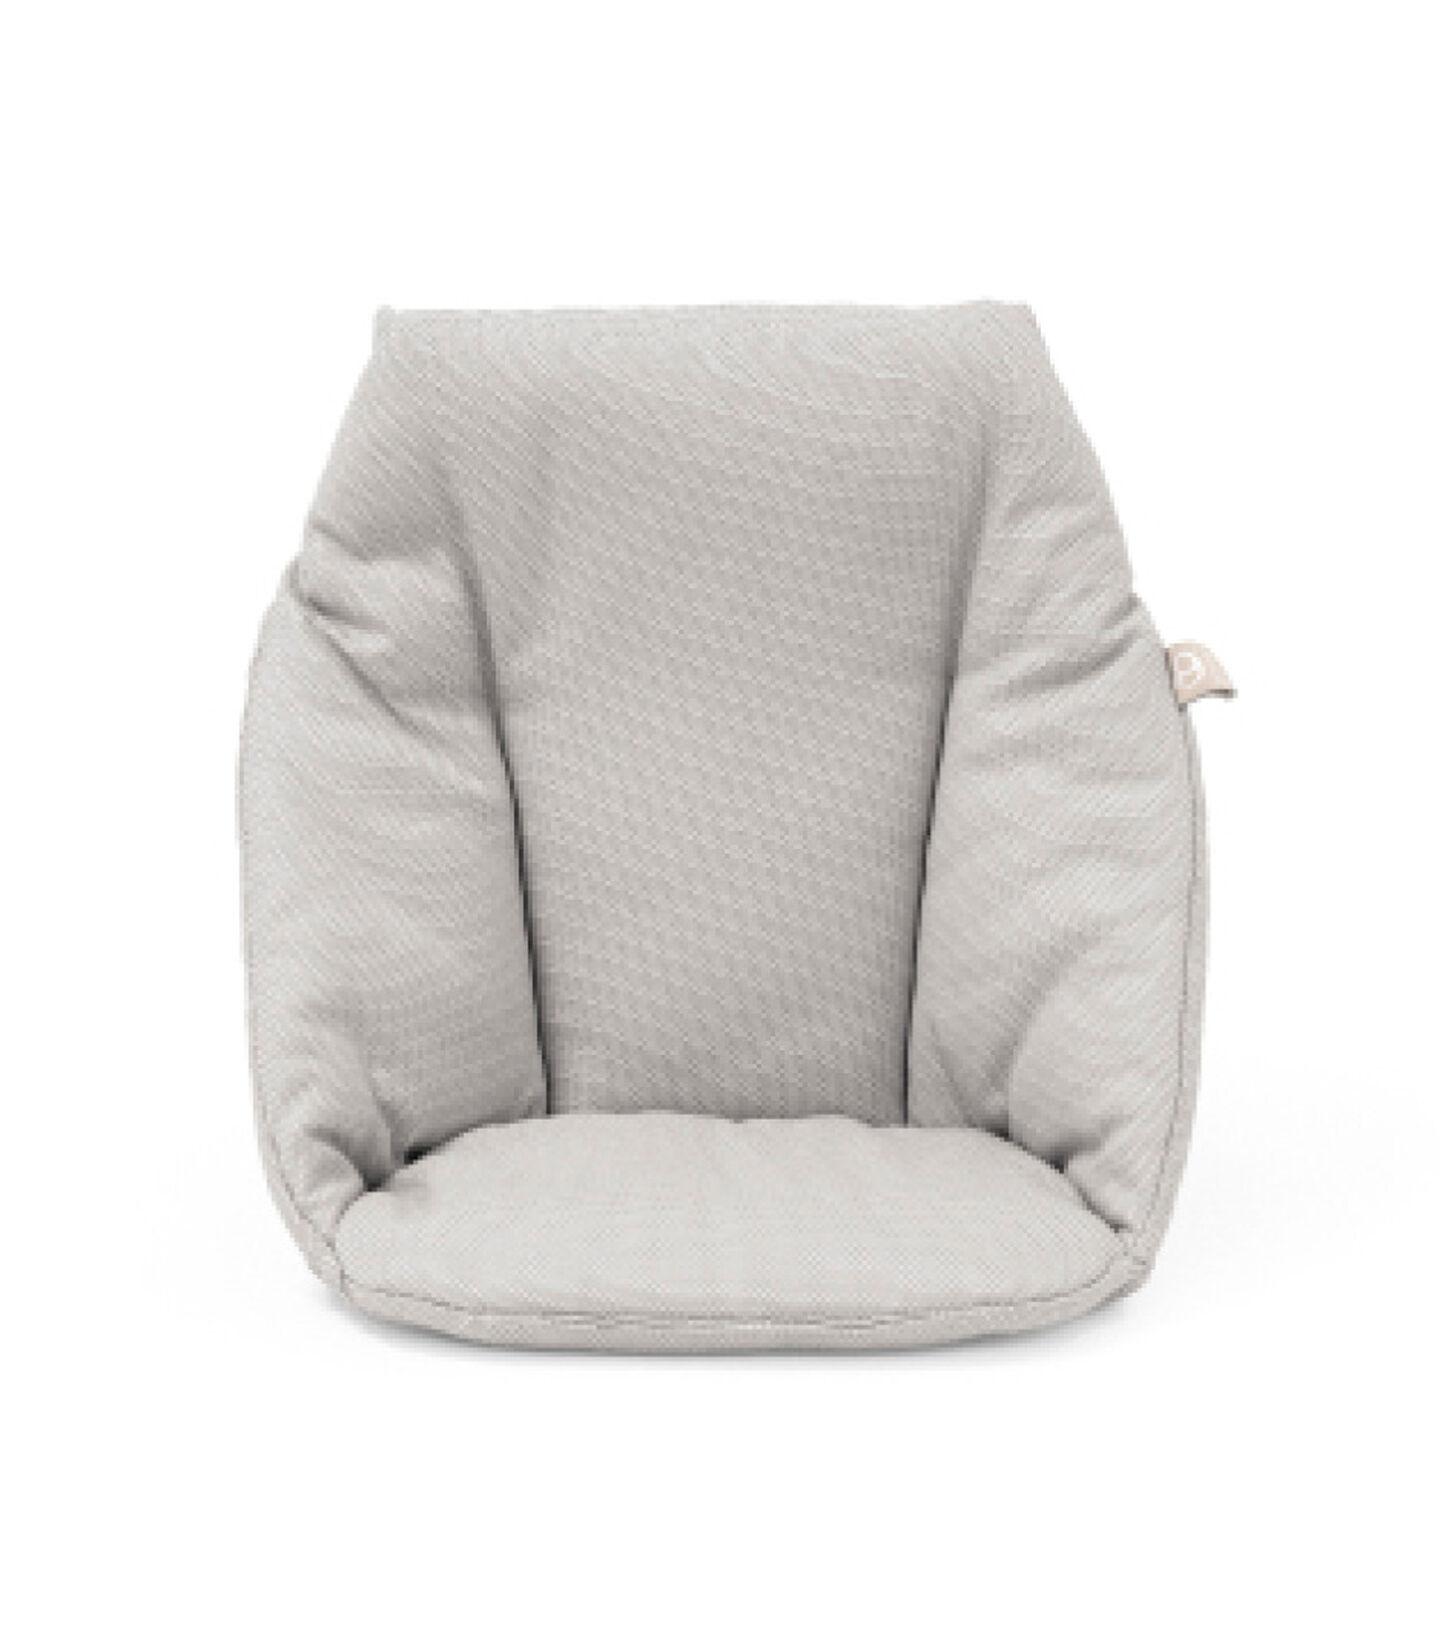 Tripp Trapp® Baby Cushion Timeless Grey OCS, Традиционный серый, mainview view 1